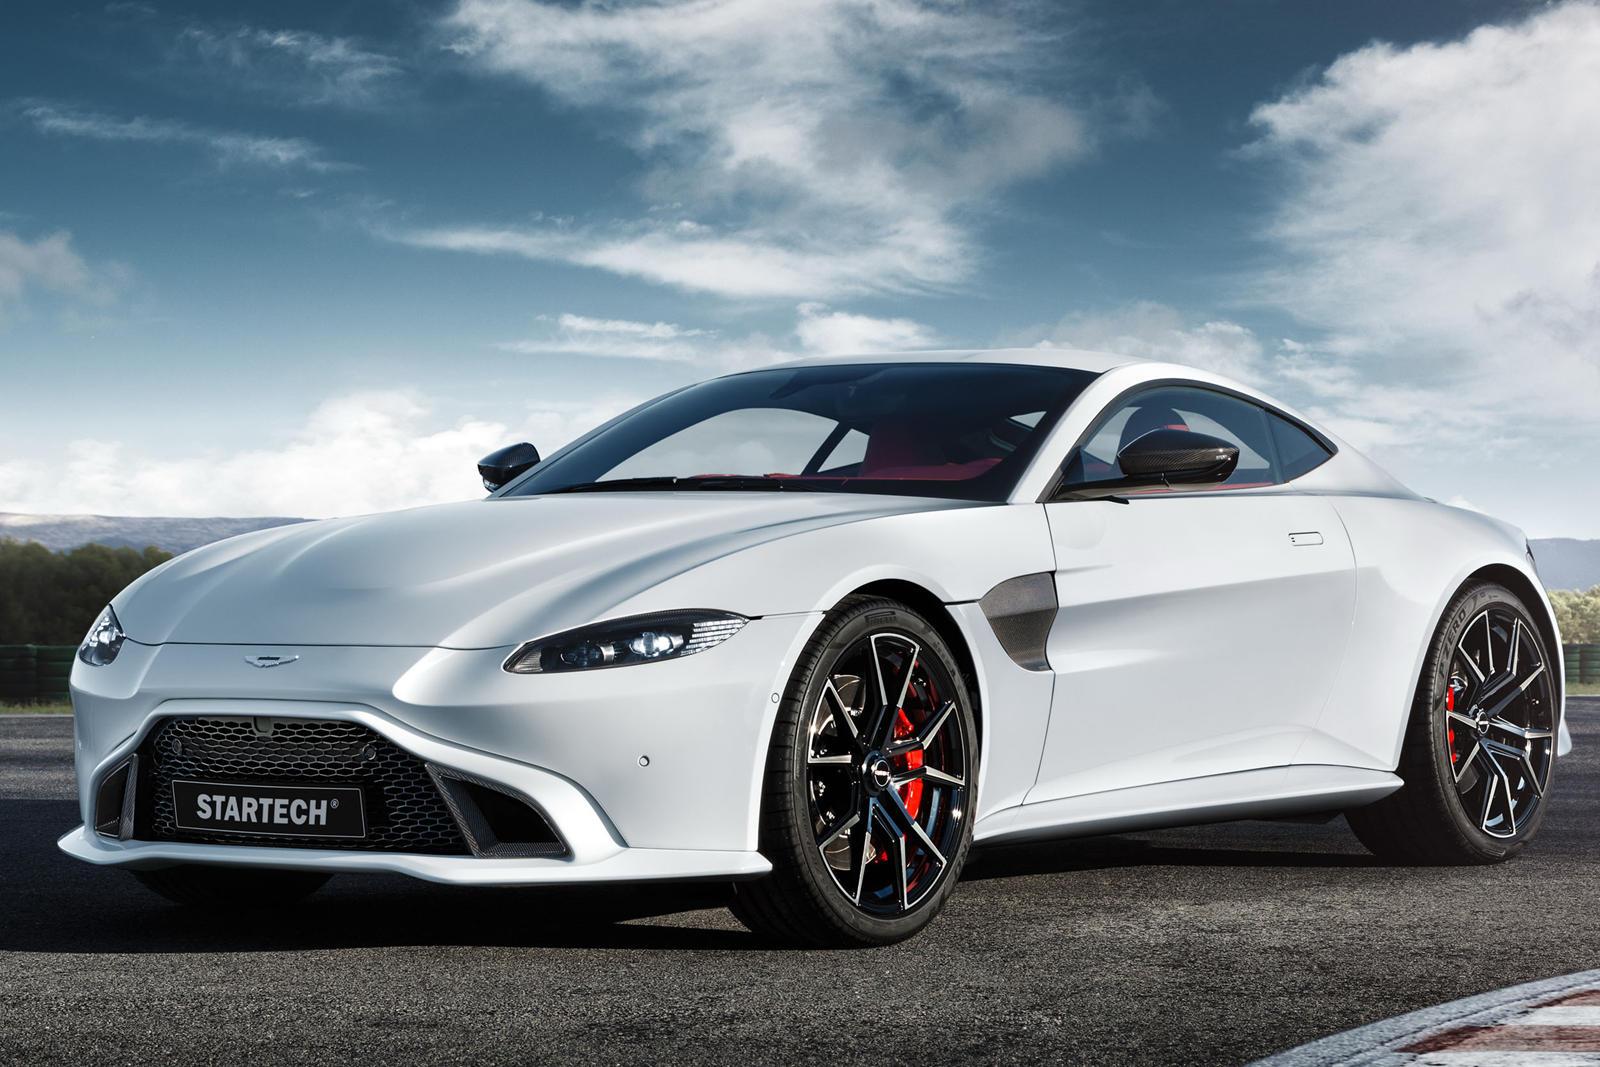 Is This 600-HP Aston Martin Vantage Worth It?